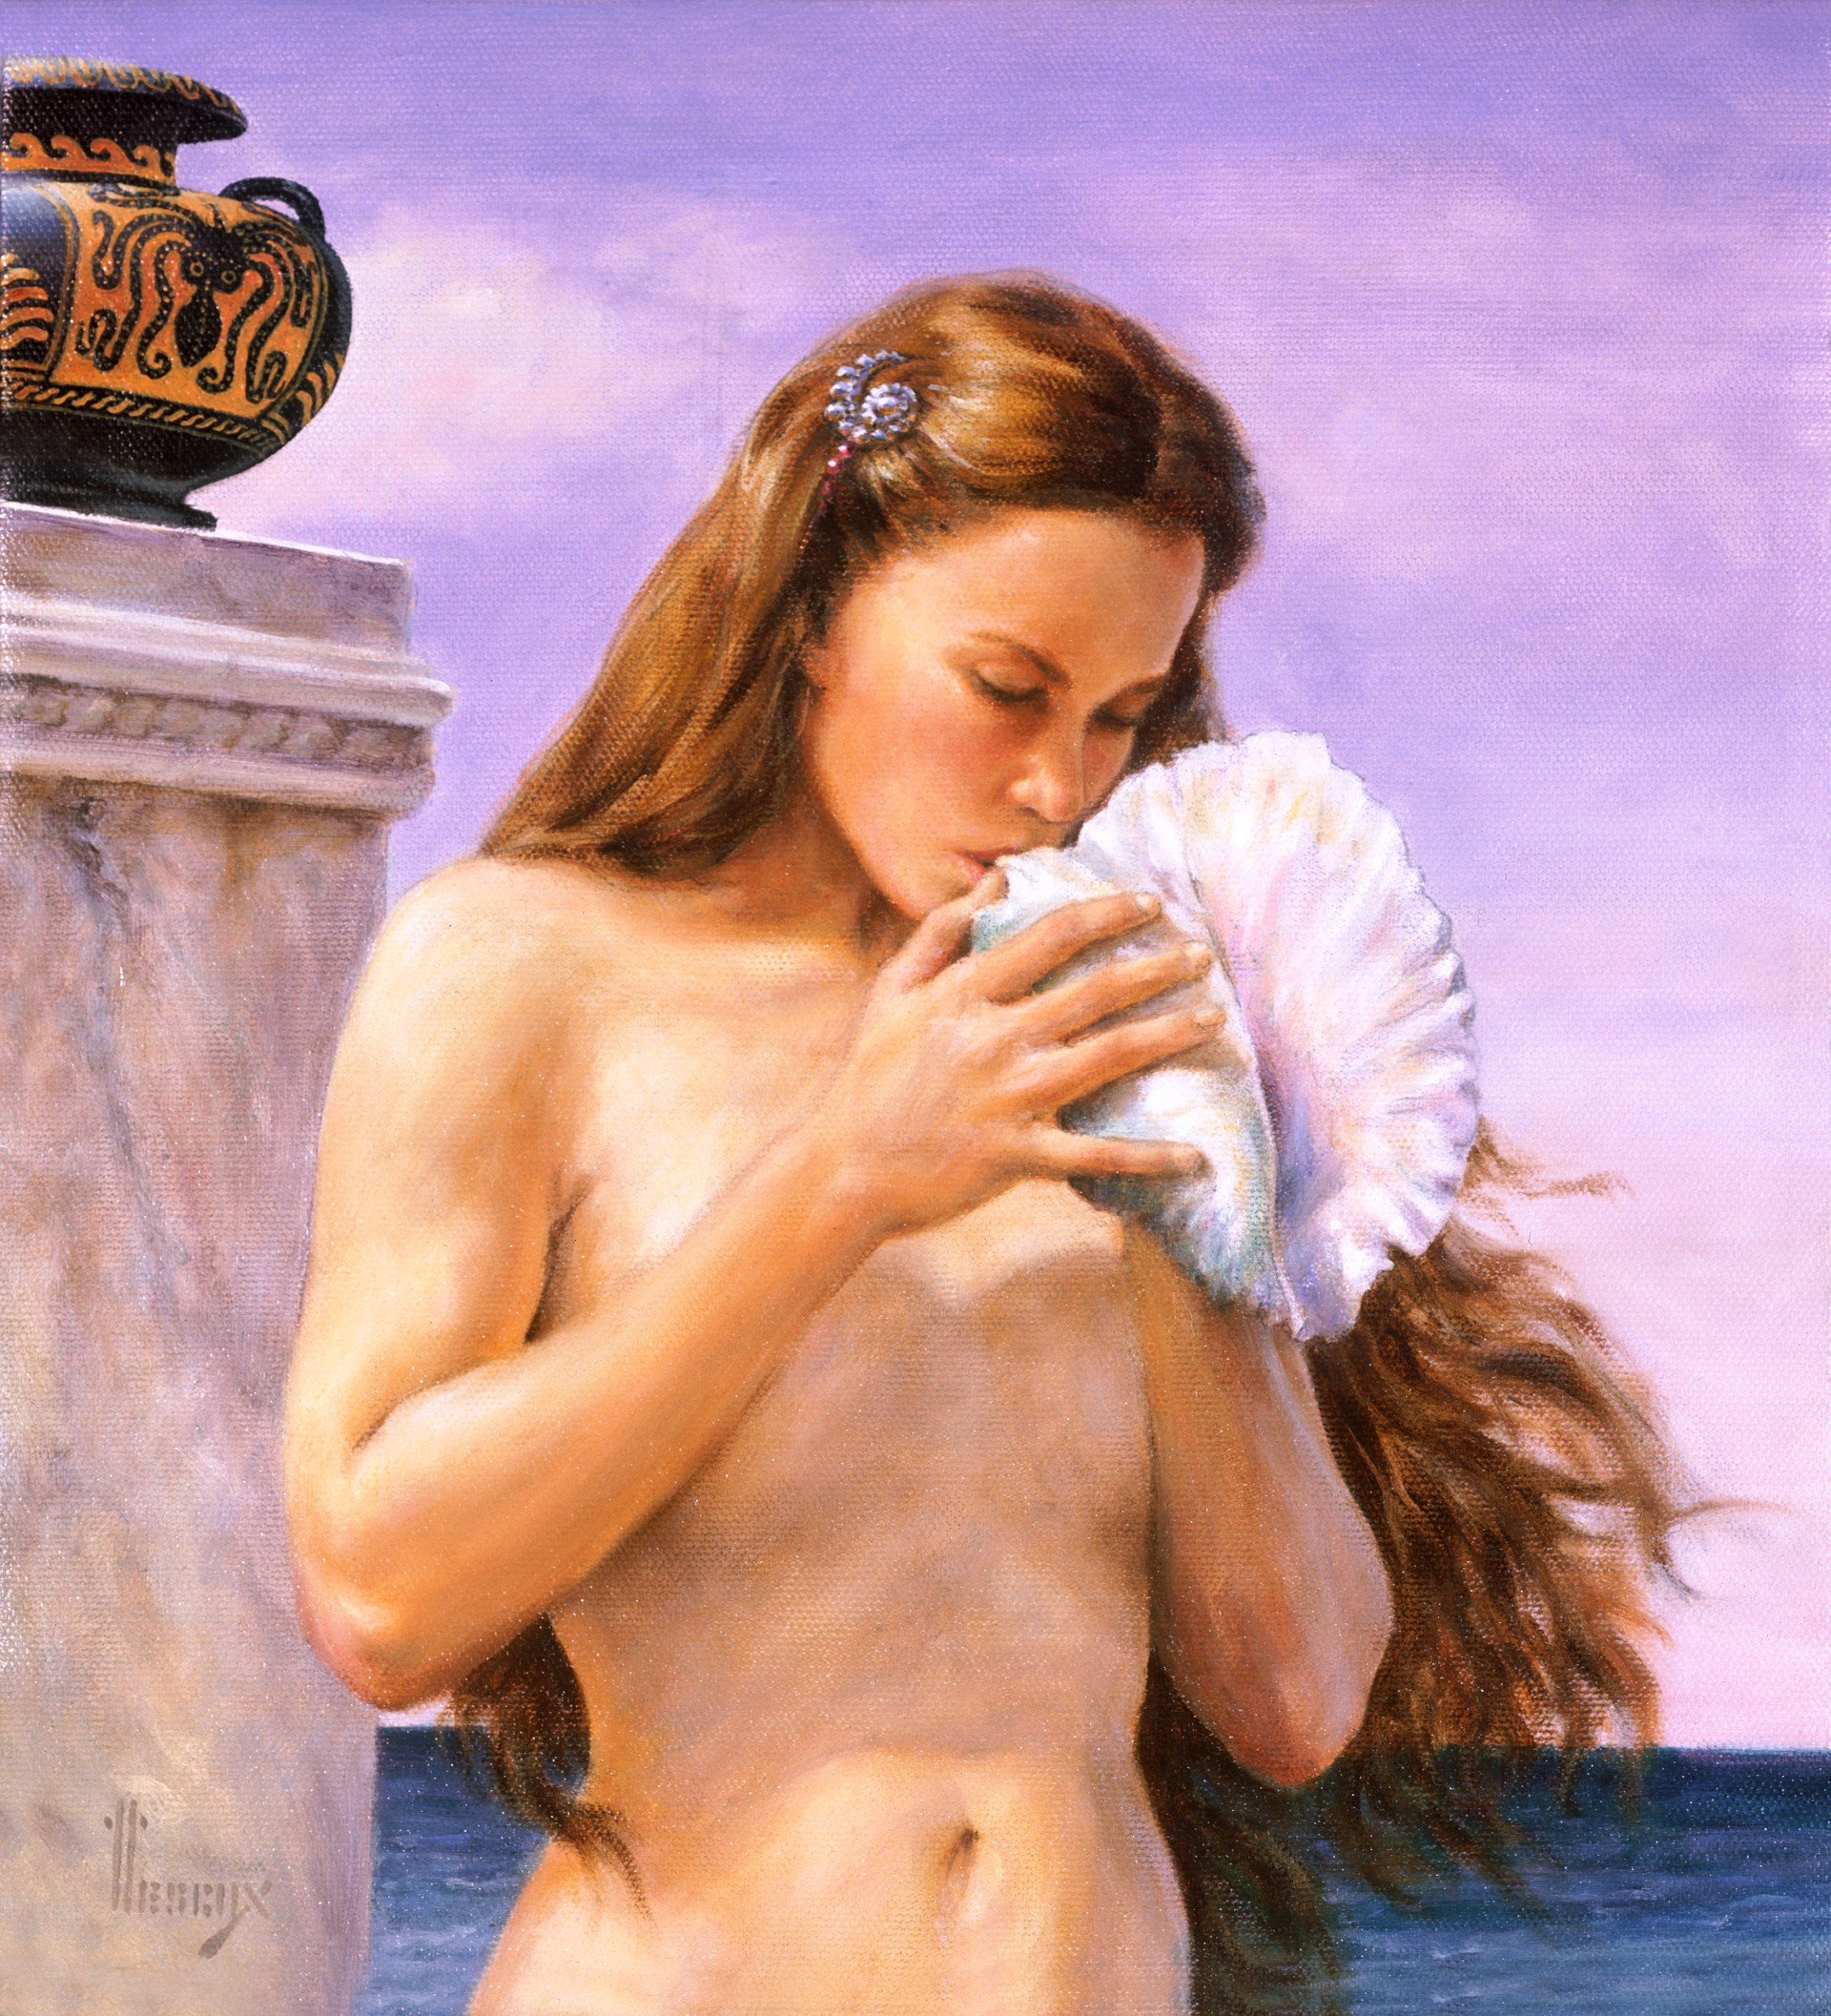 Poseidon's Daughter by Richard Hescox